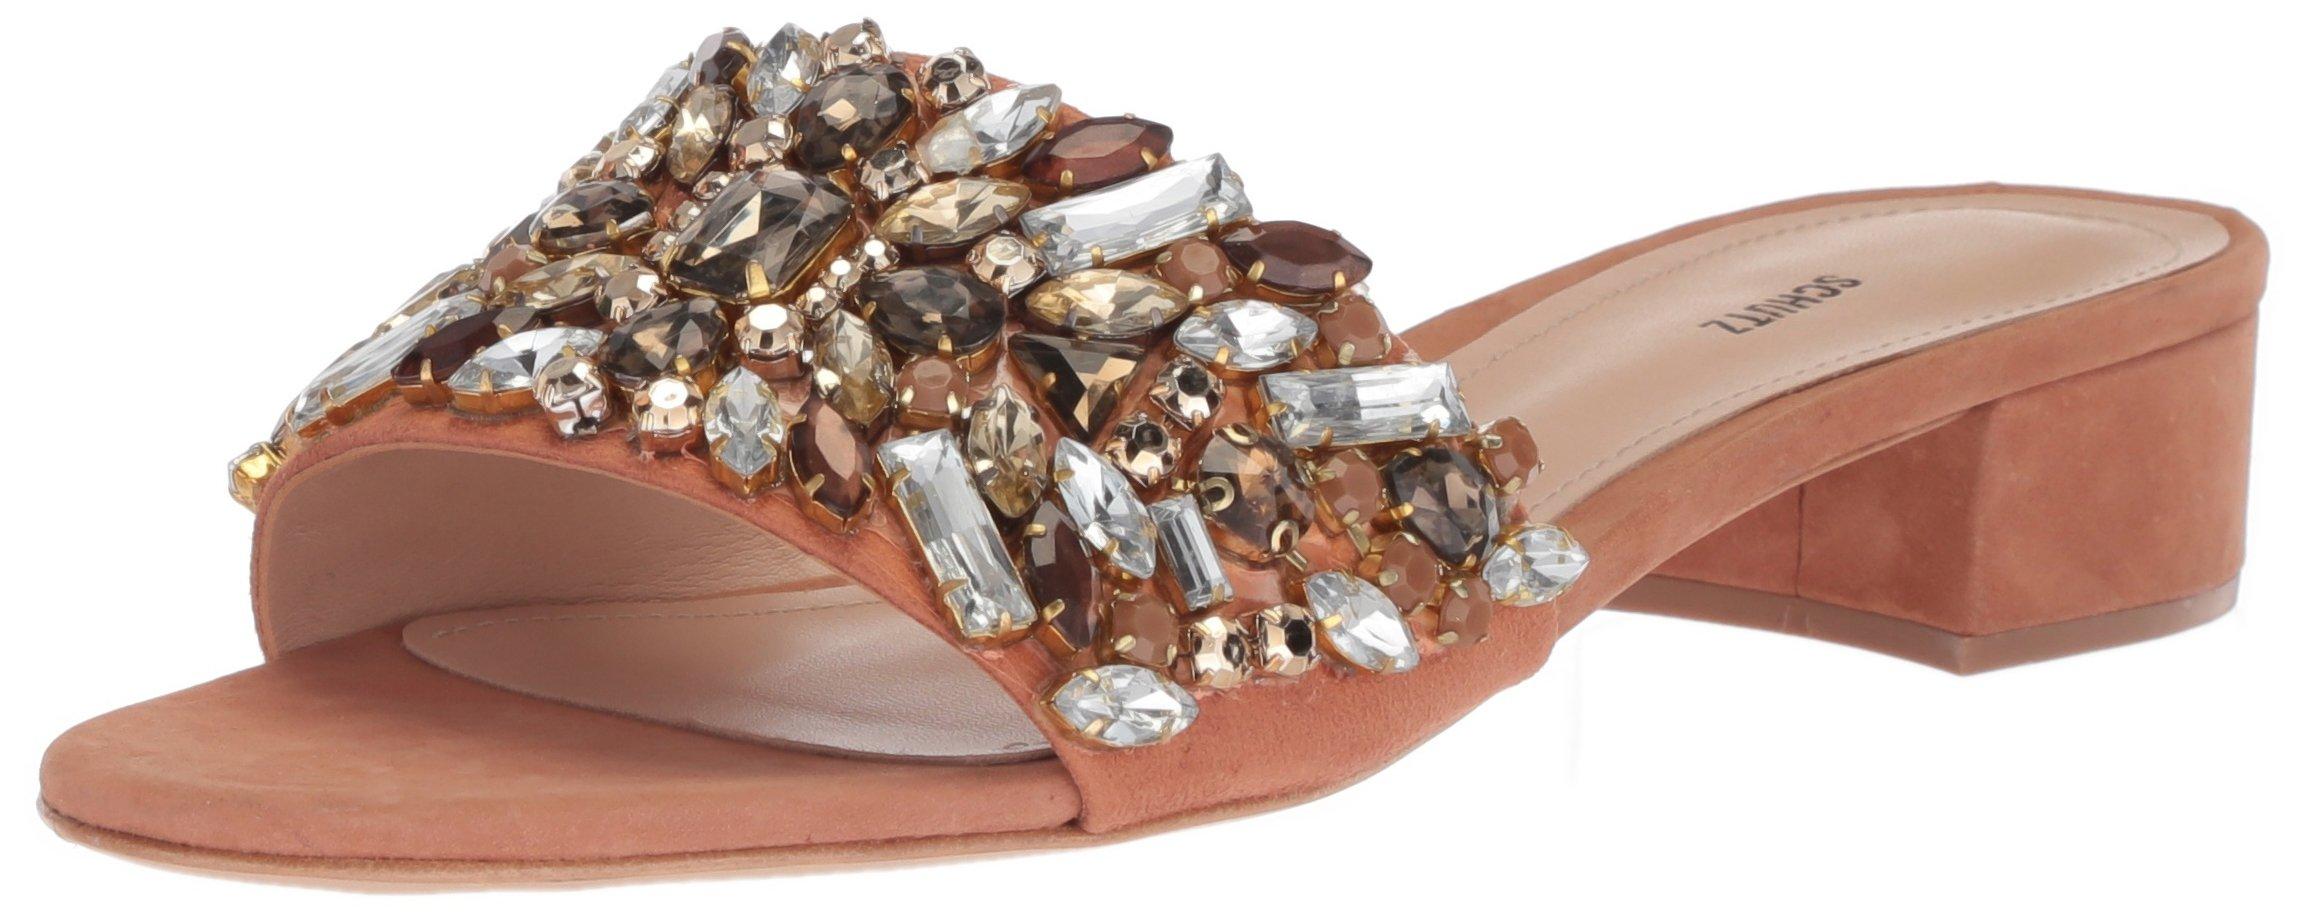 SCHUTZ Women's Victoria Slide Sandal, Toasted Nut, 10 M US